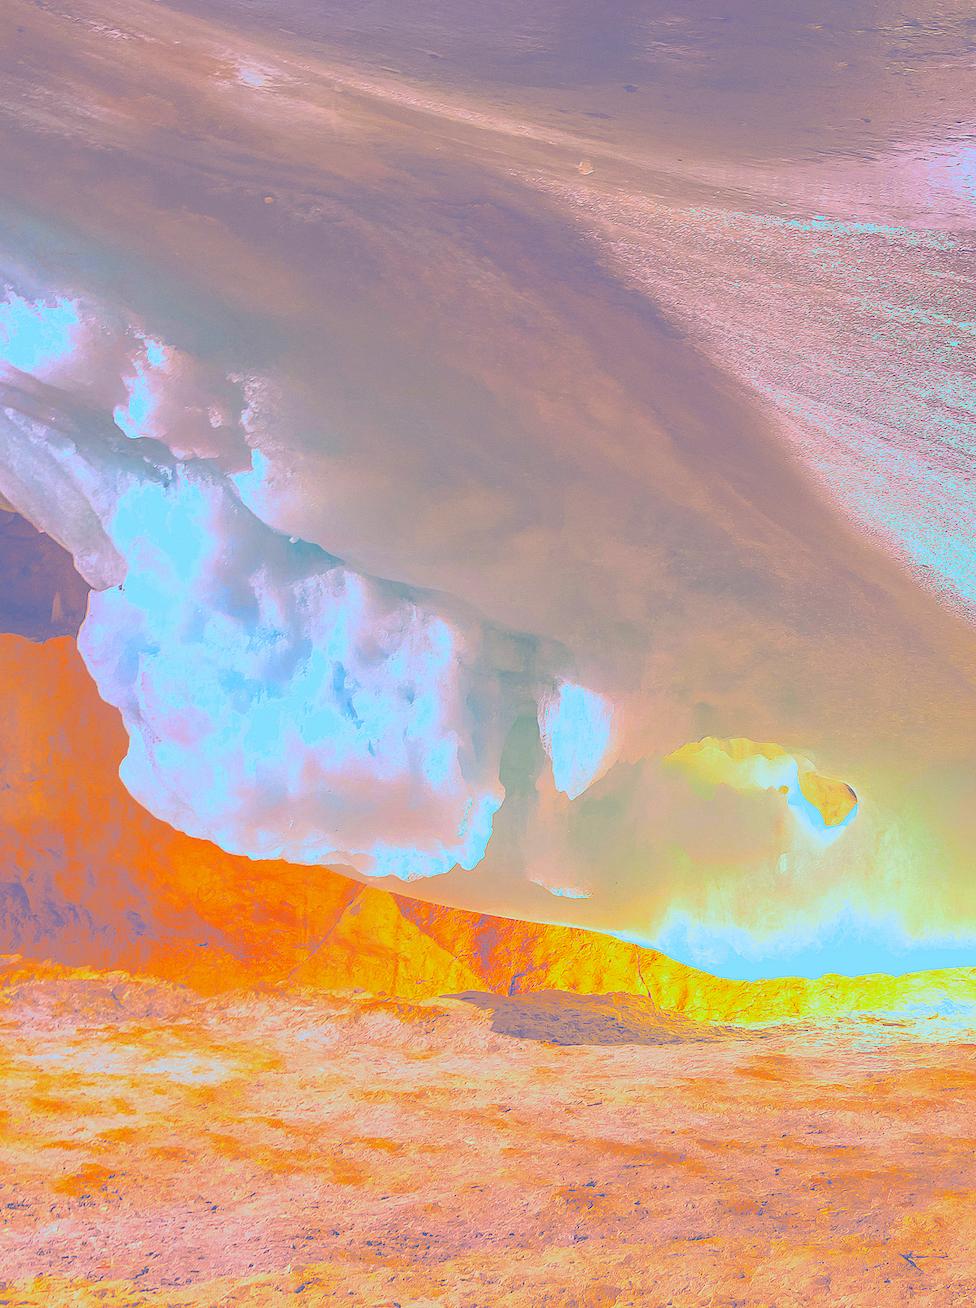 Beyond the Oecumene / Part III,  2019 Aquarelle, wax pastels, UV-print on aluminium beneath linear Plexiglas 190 x 150 cm (75 x 59 in)